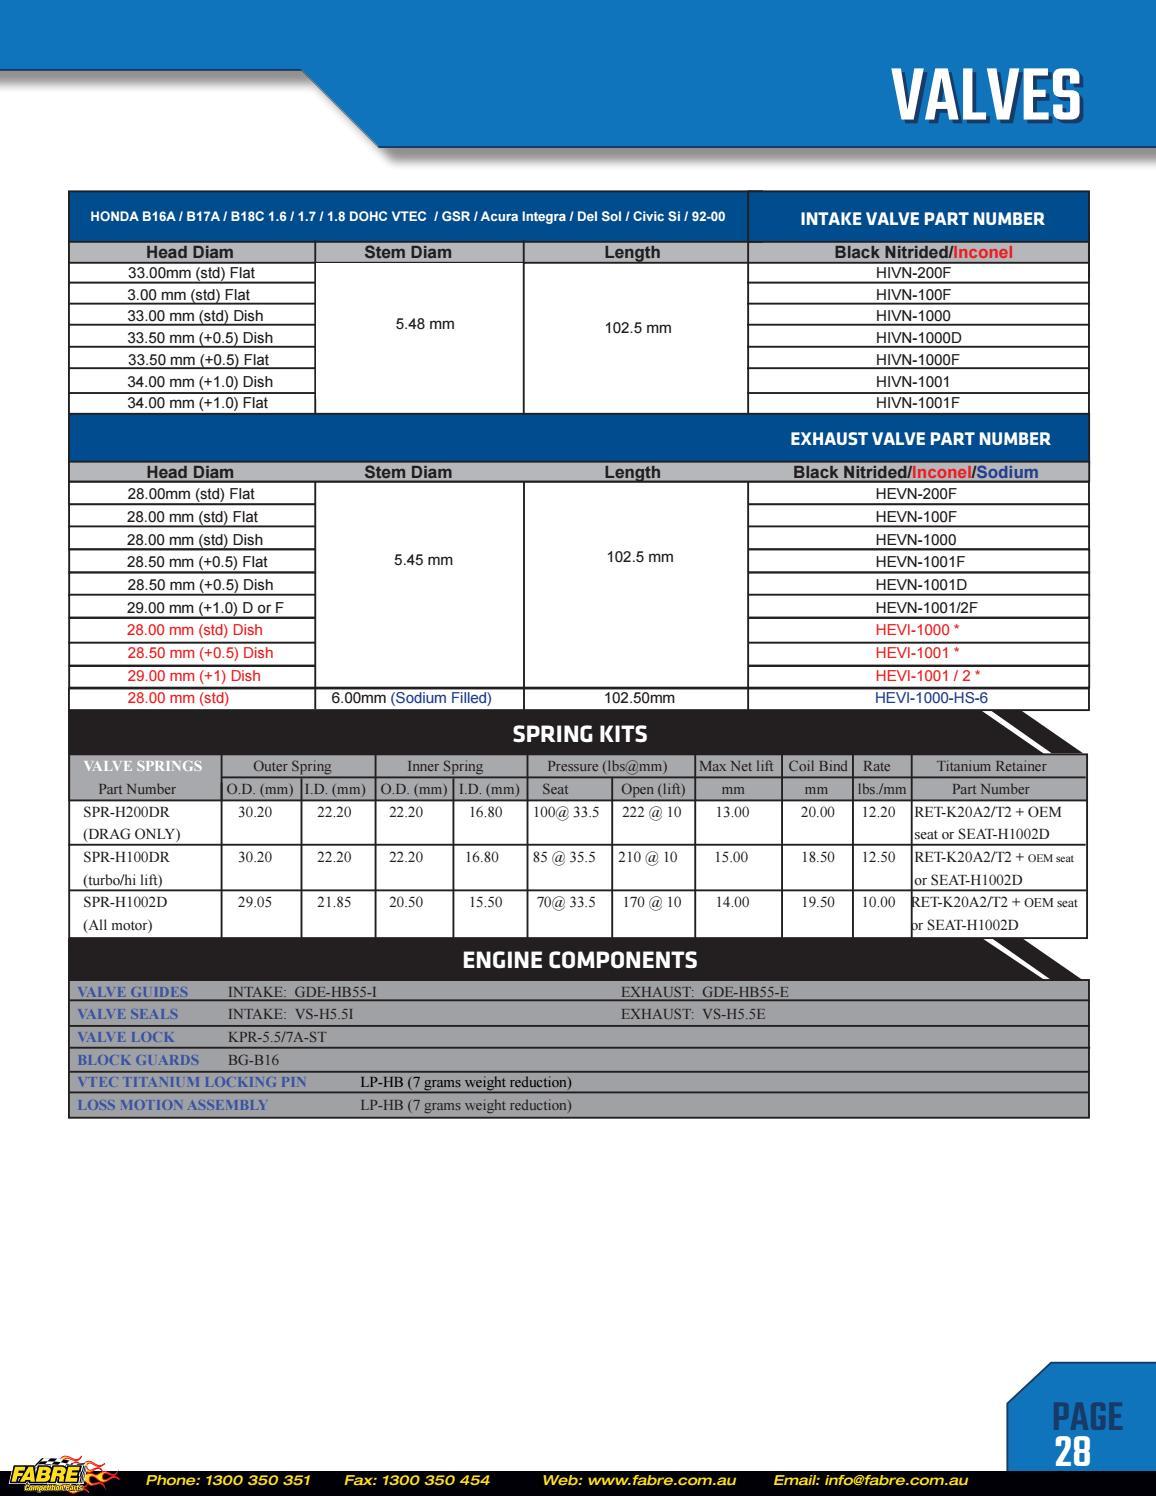 Acura B16A //B17A //B18C VTEC Supertech Black Nitrided Exhaust Valve for Honda